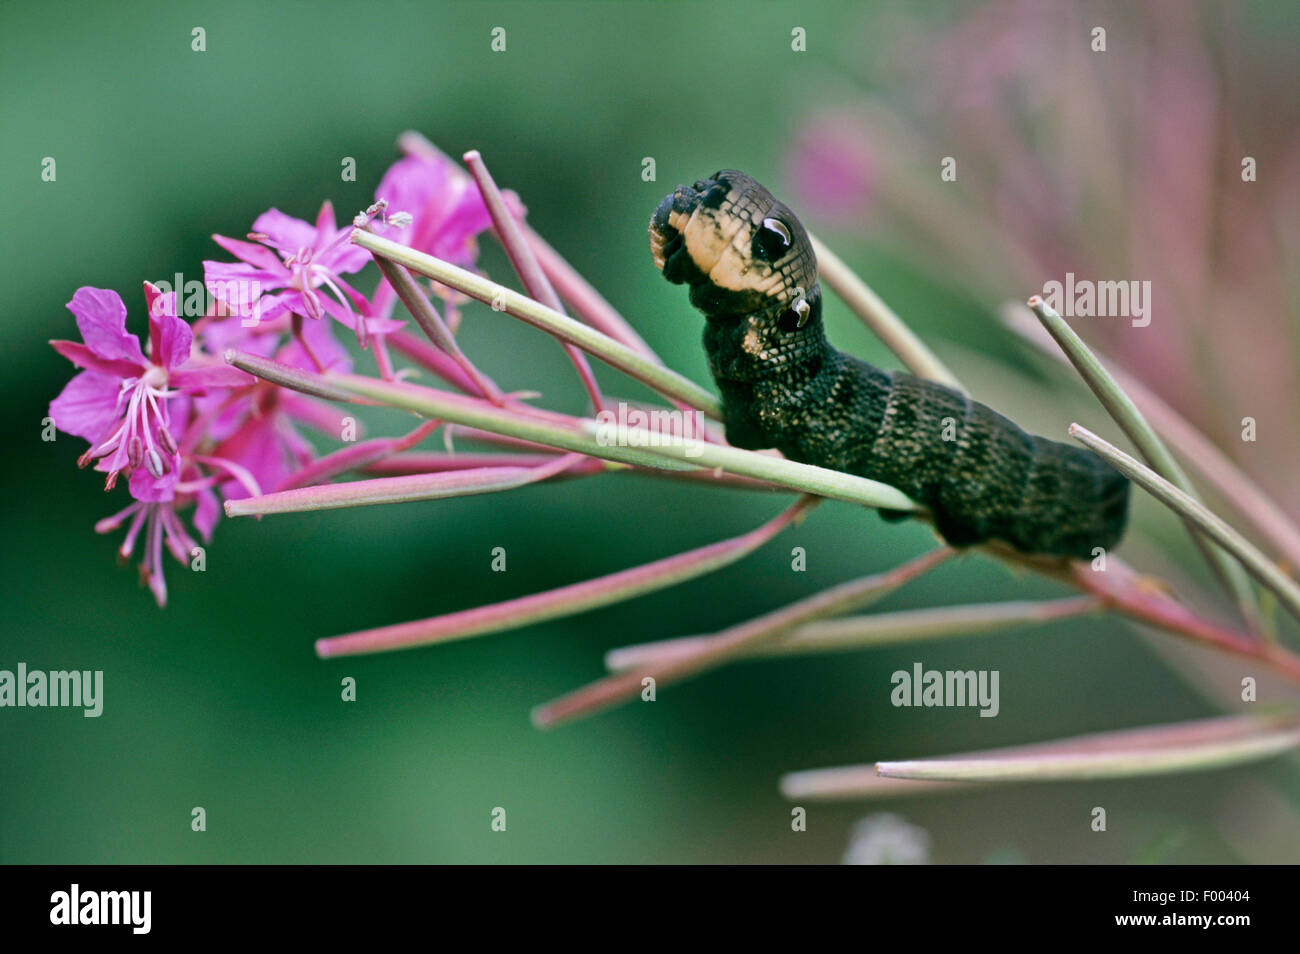 elephant hawkmoth (Deilephila elpenor), caterpillar on willowherb, Germany - Stock Image